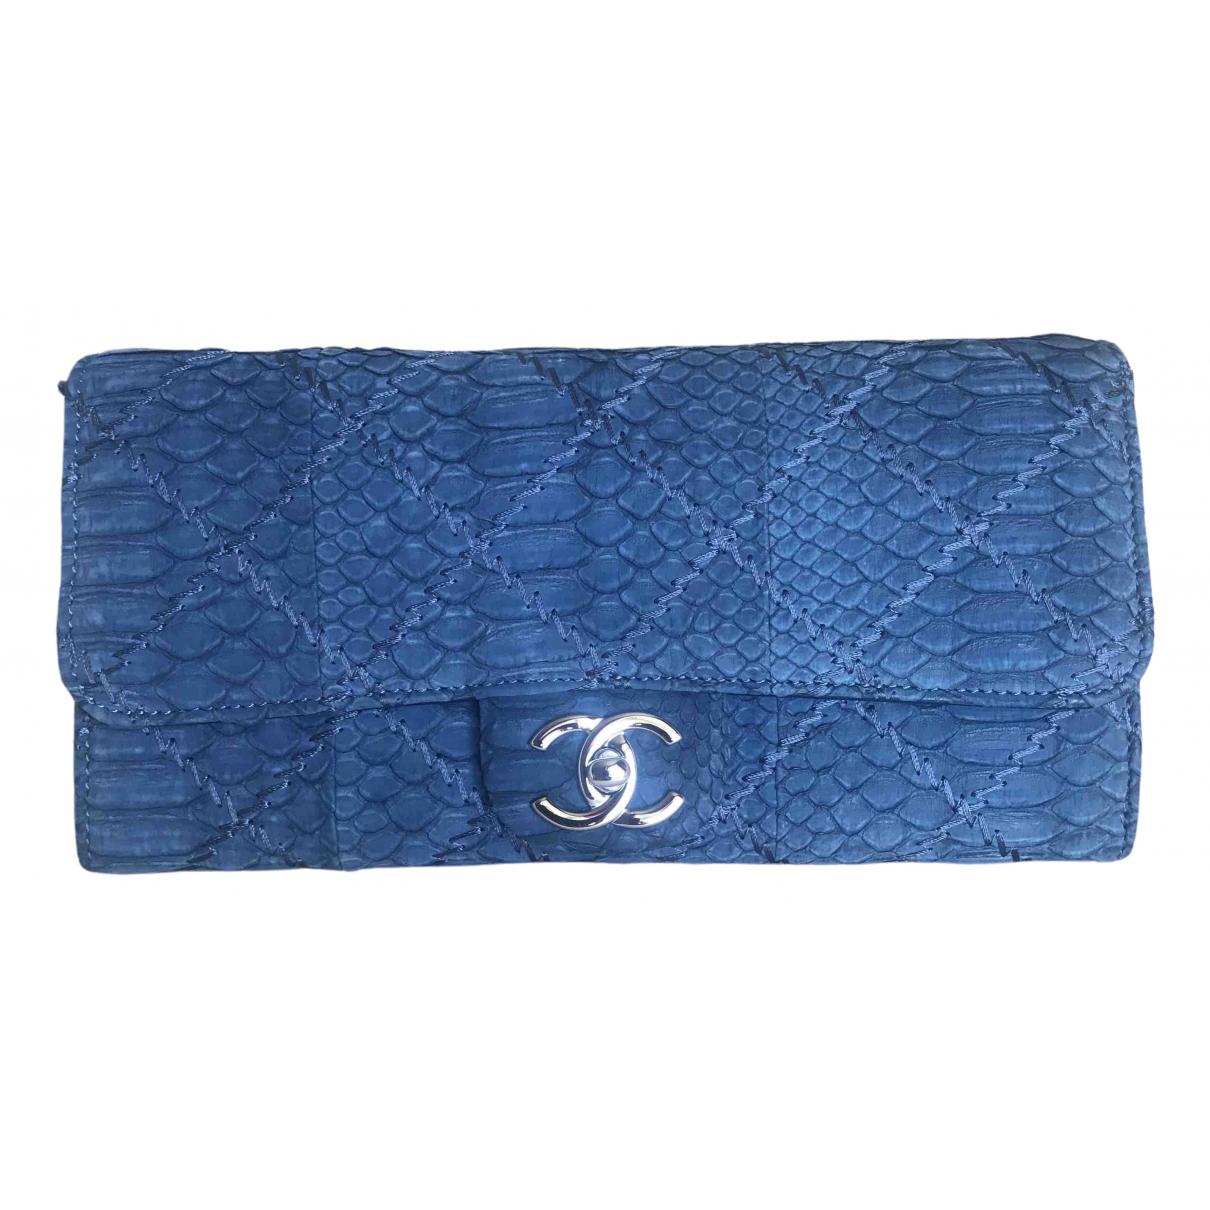 Chanel - Pochette   pour femme en python - bleu